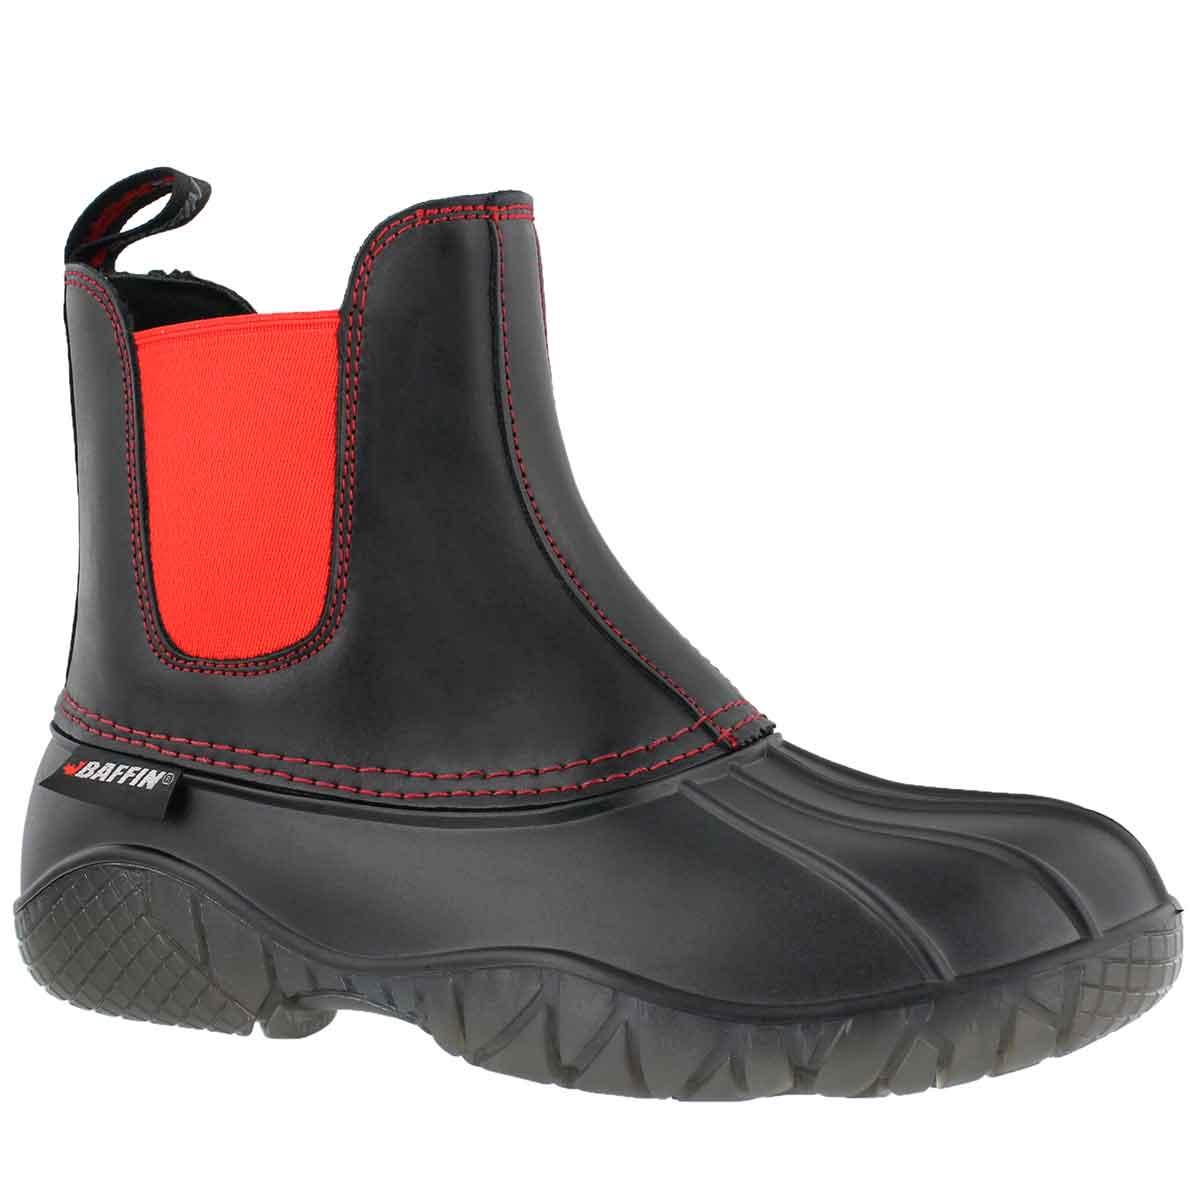 Lds Huron blk/red wtpf chelsea rainboot